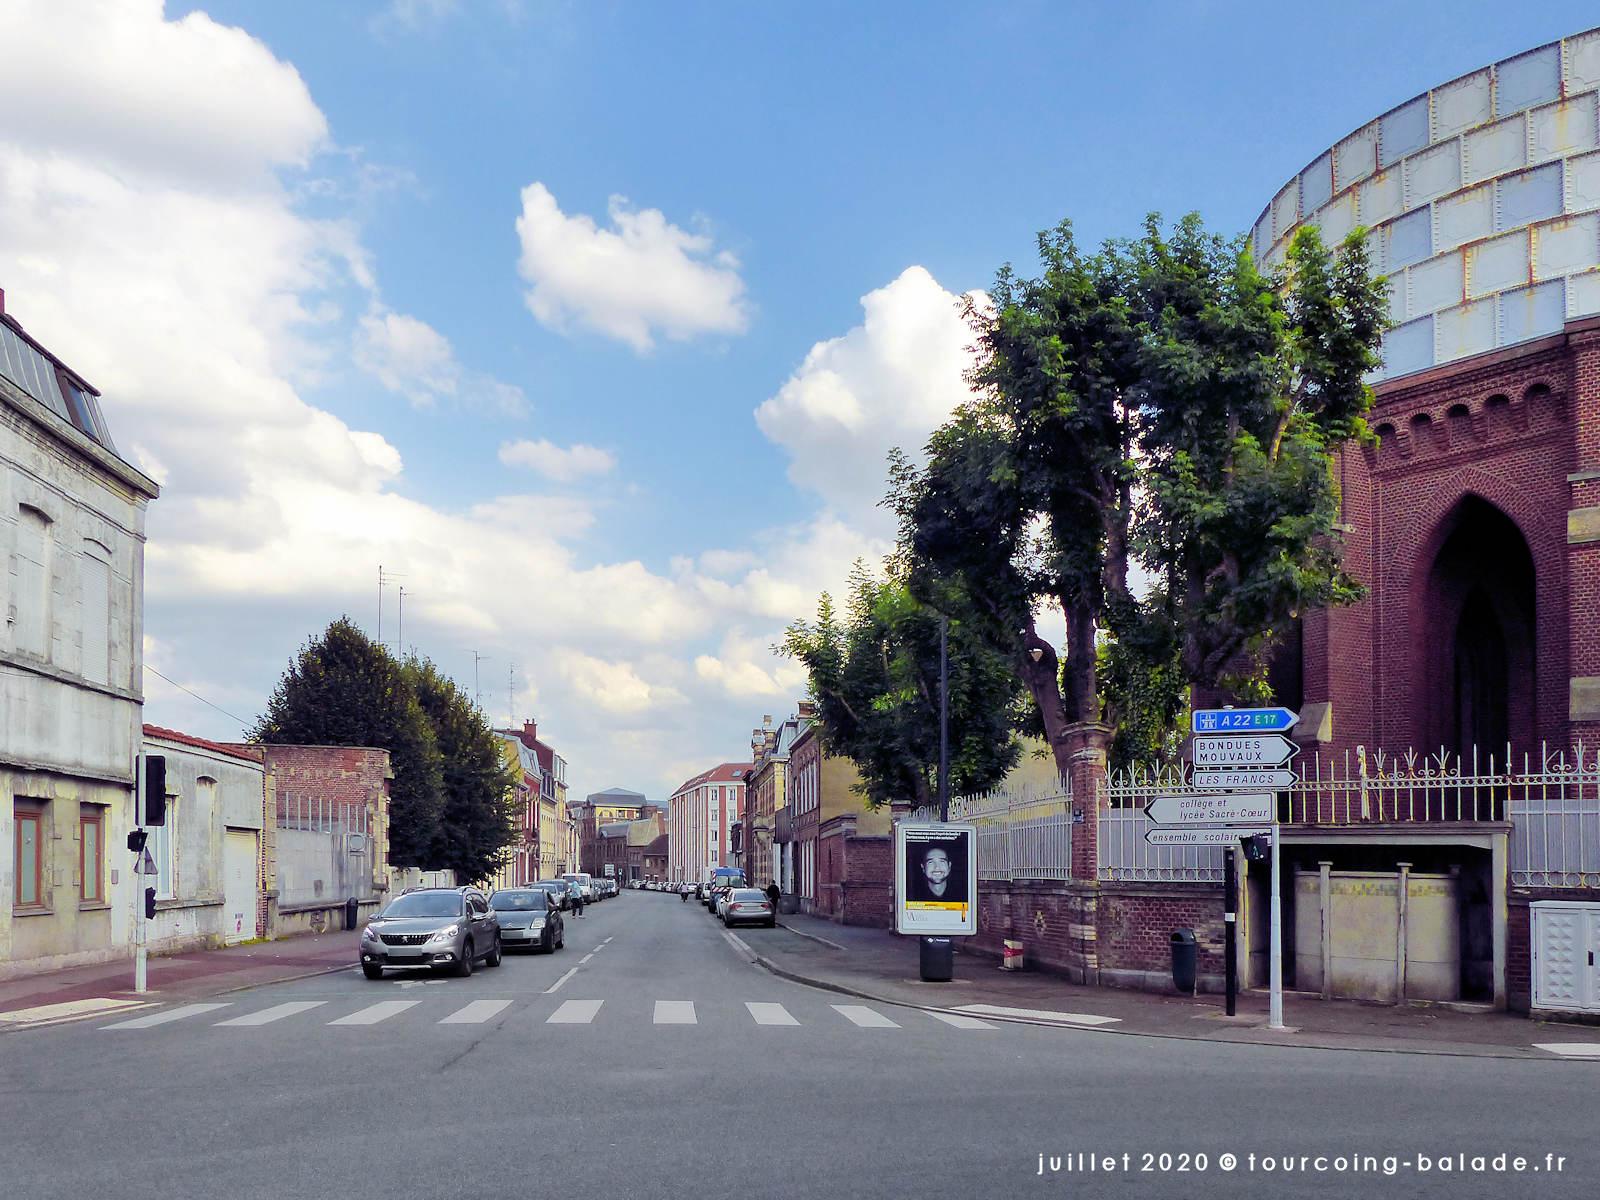 Rue de Lille, Tourcoing 2020